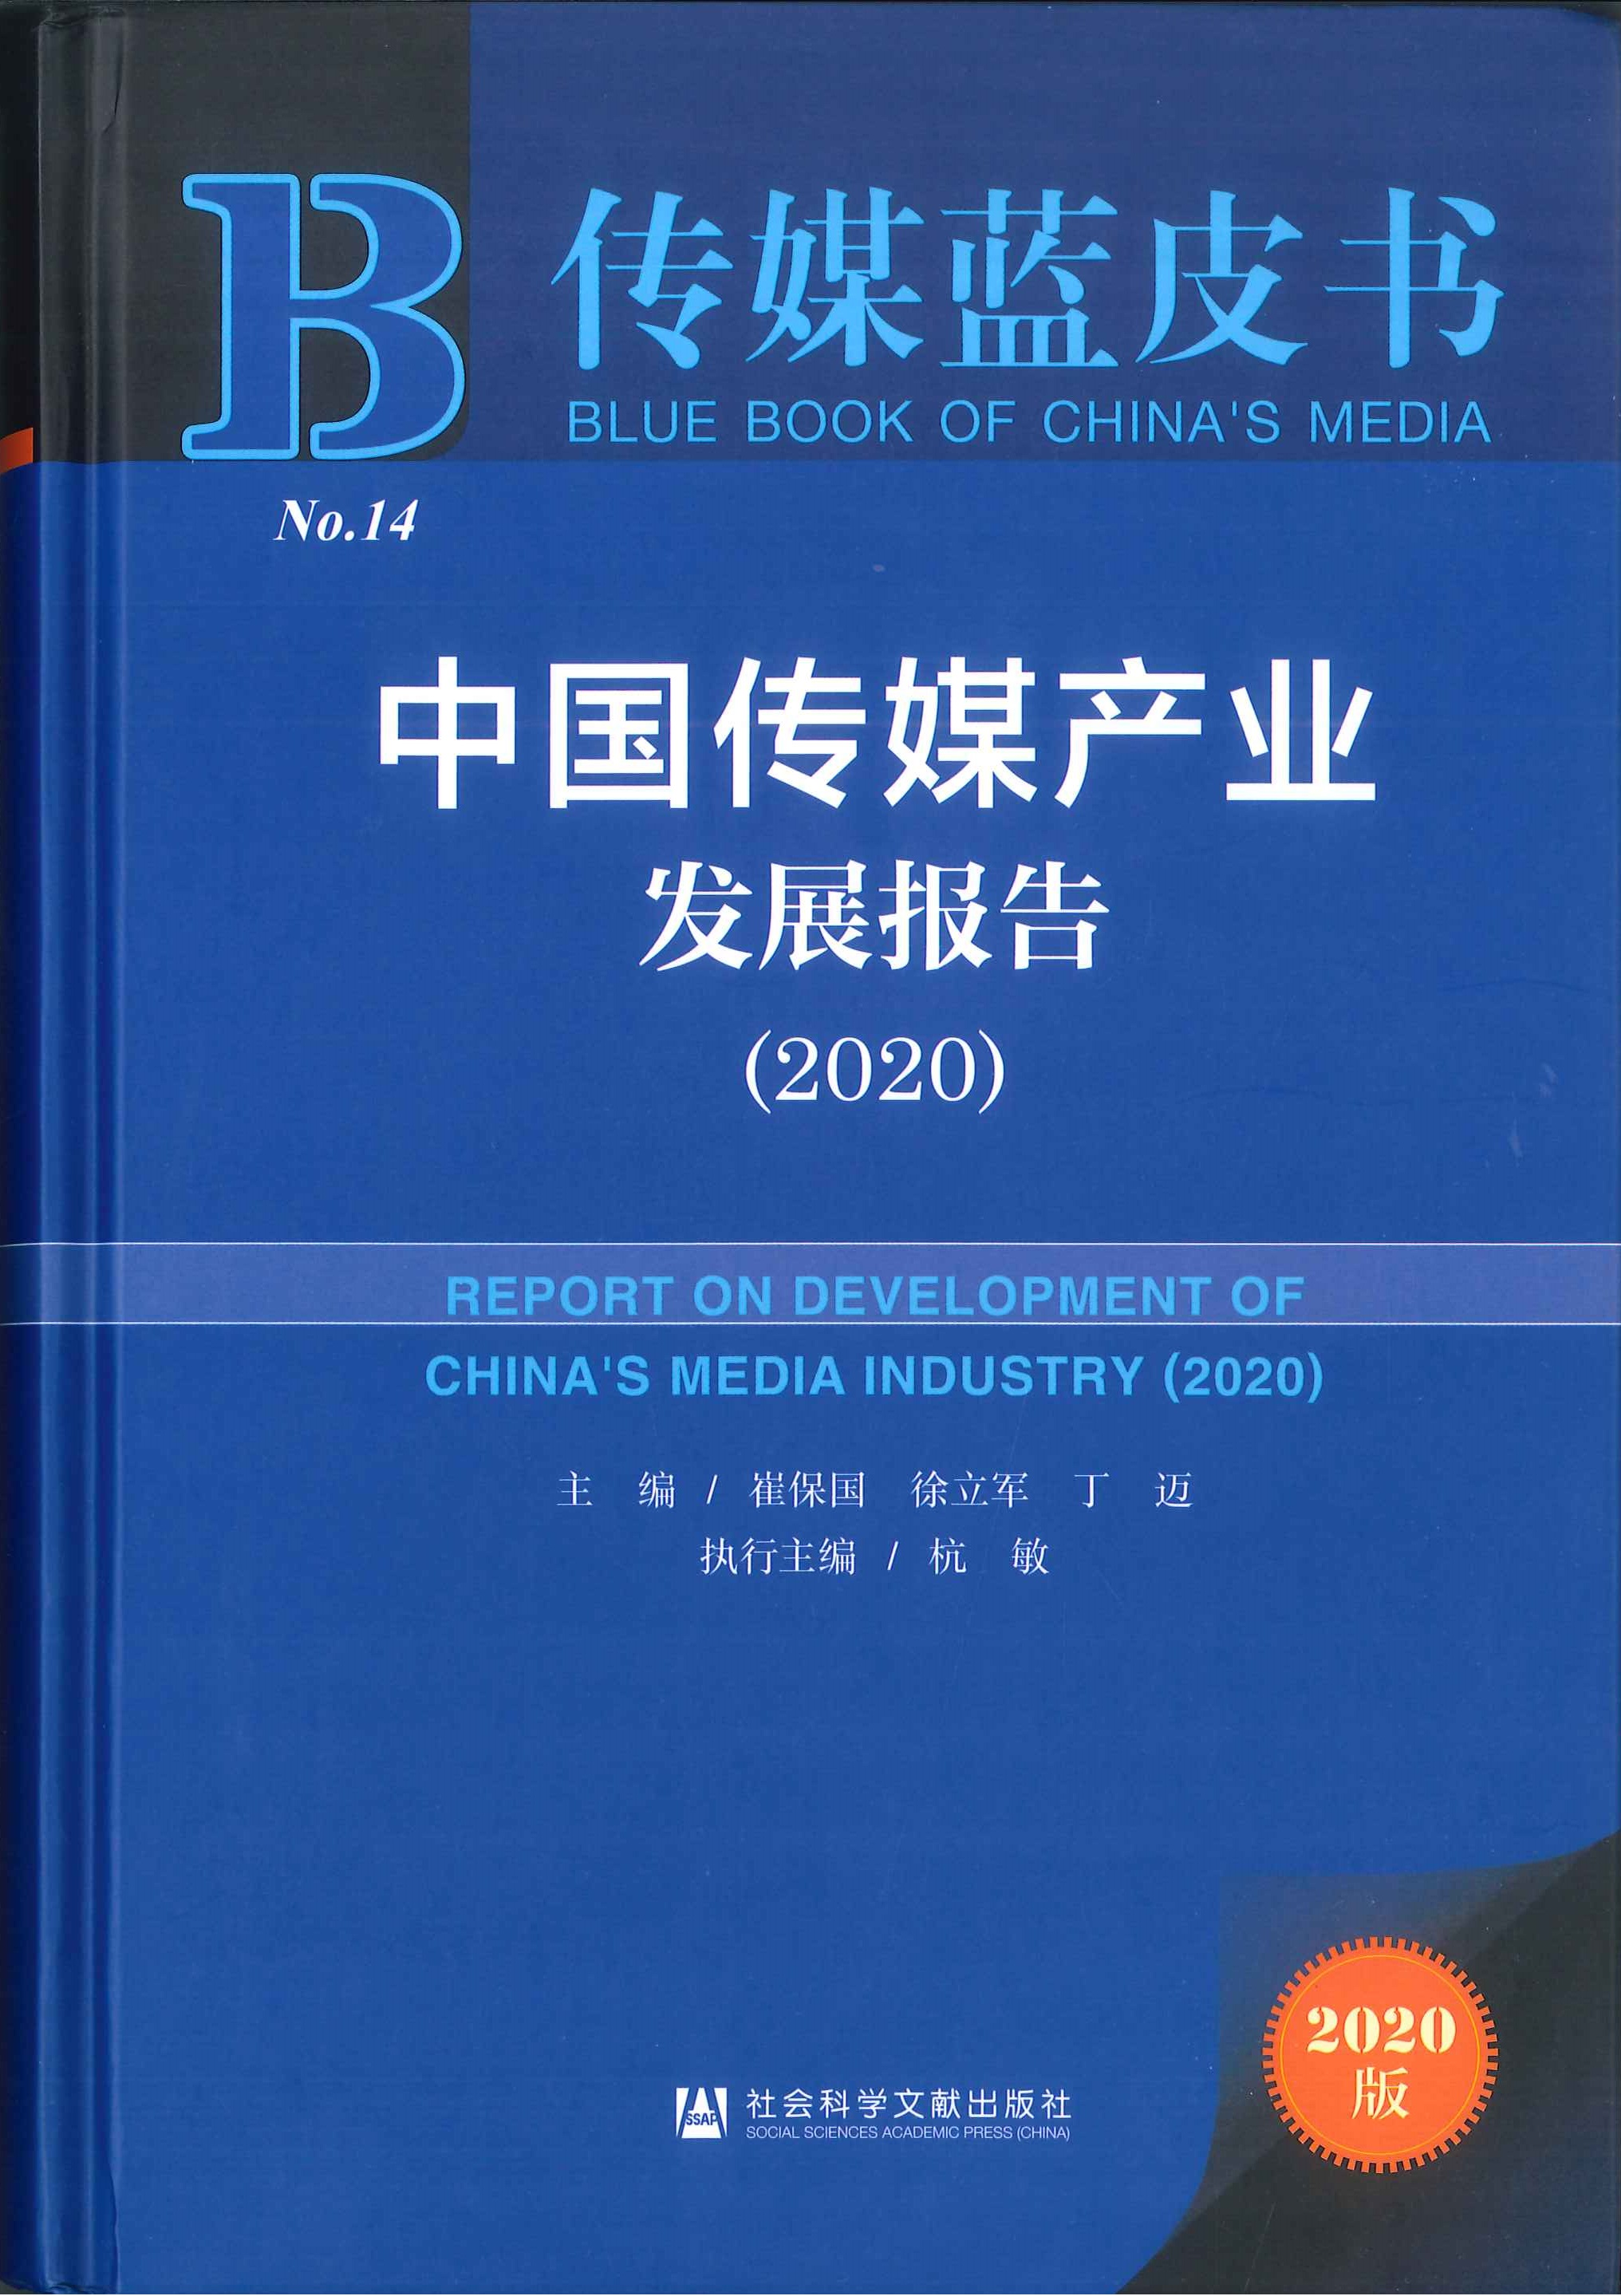 中国传媒产业发展报告=Report on development of China